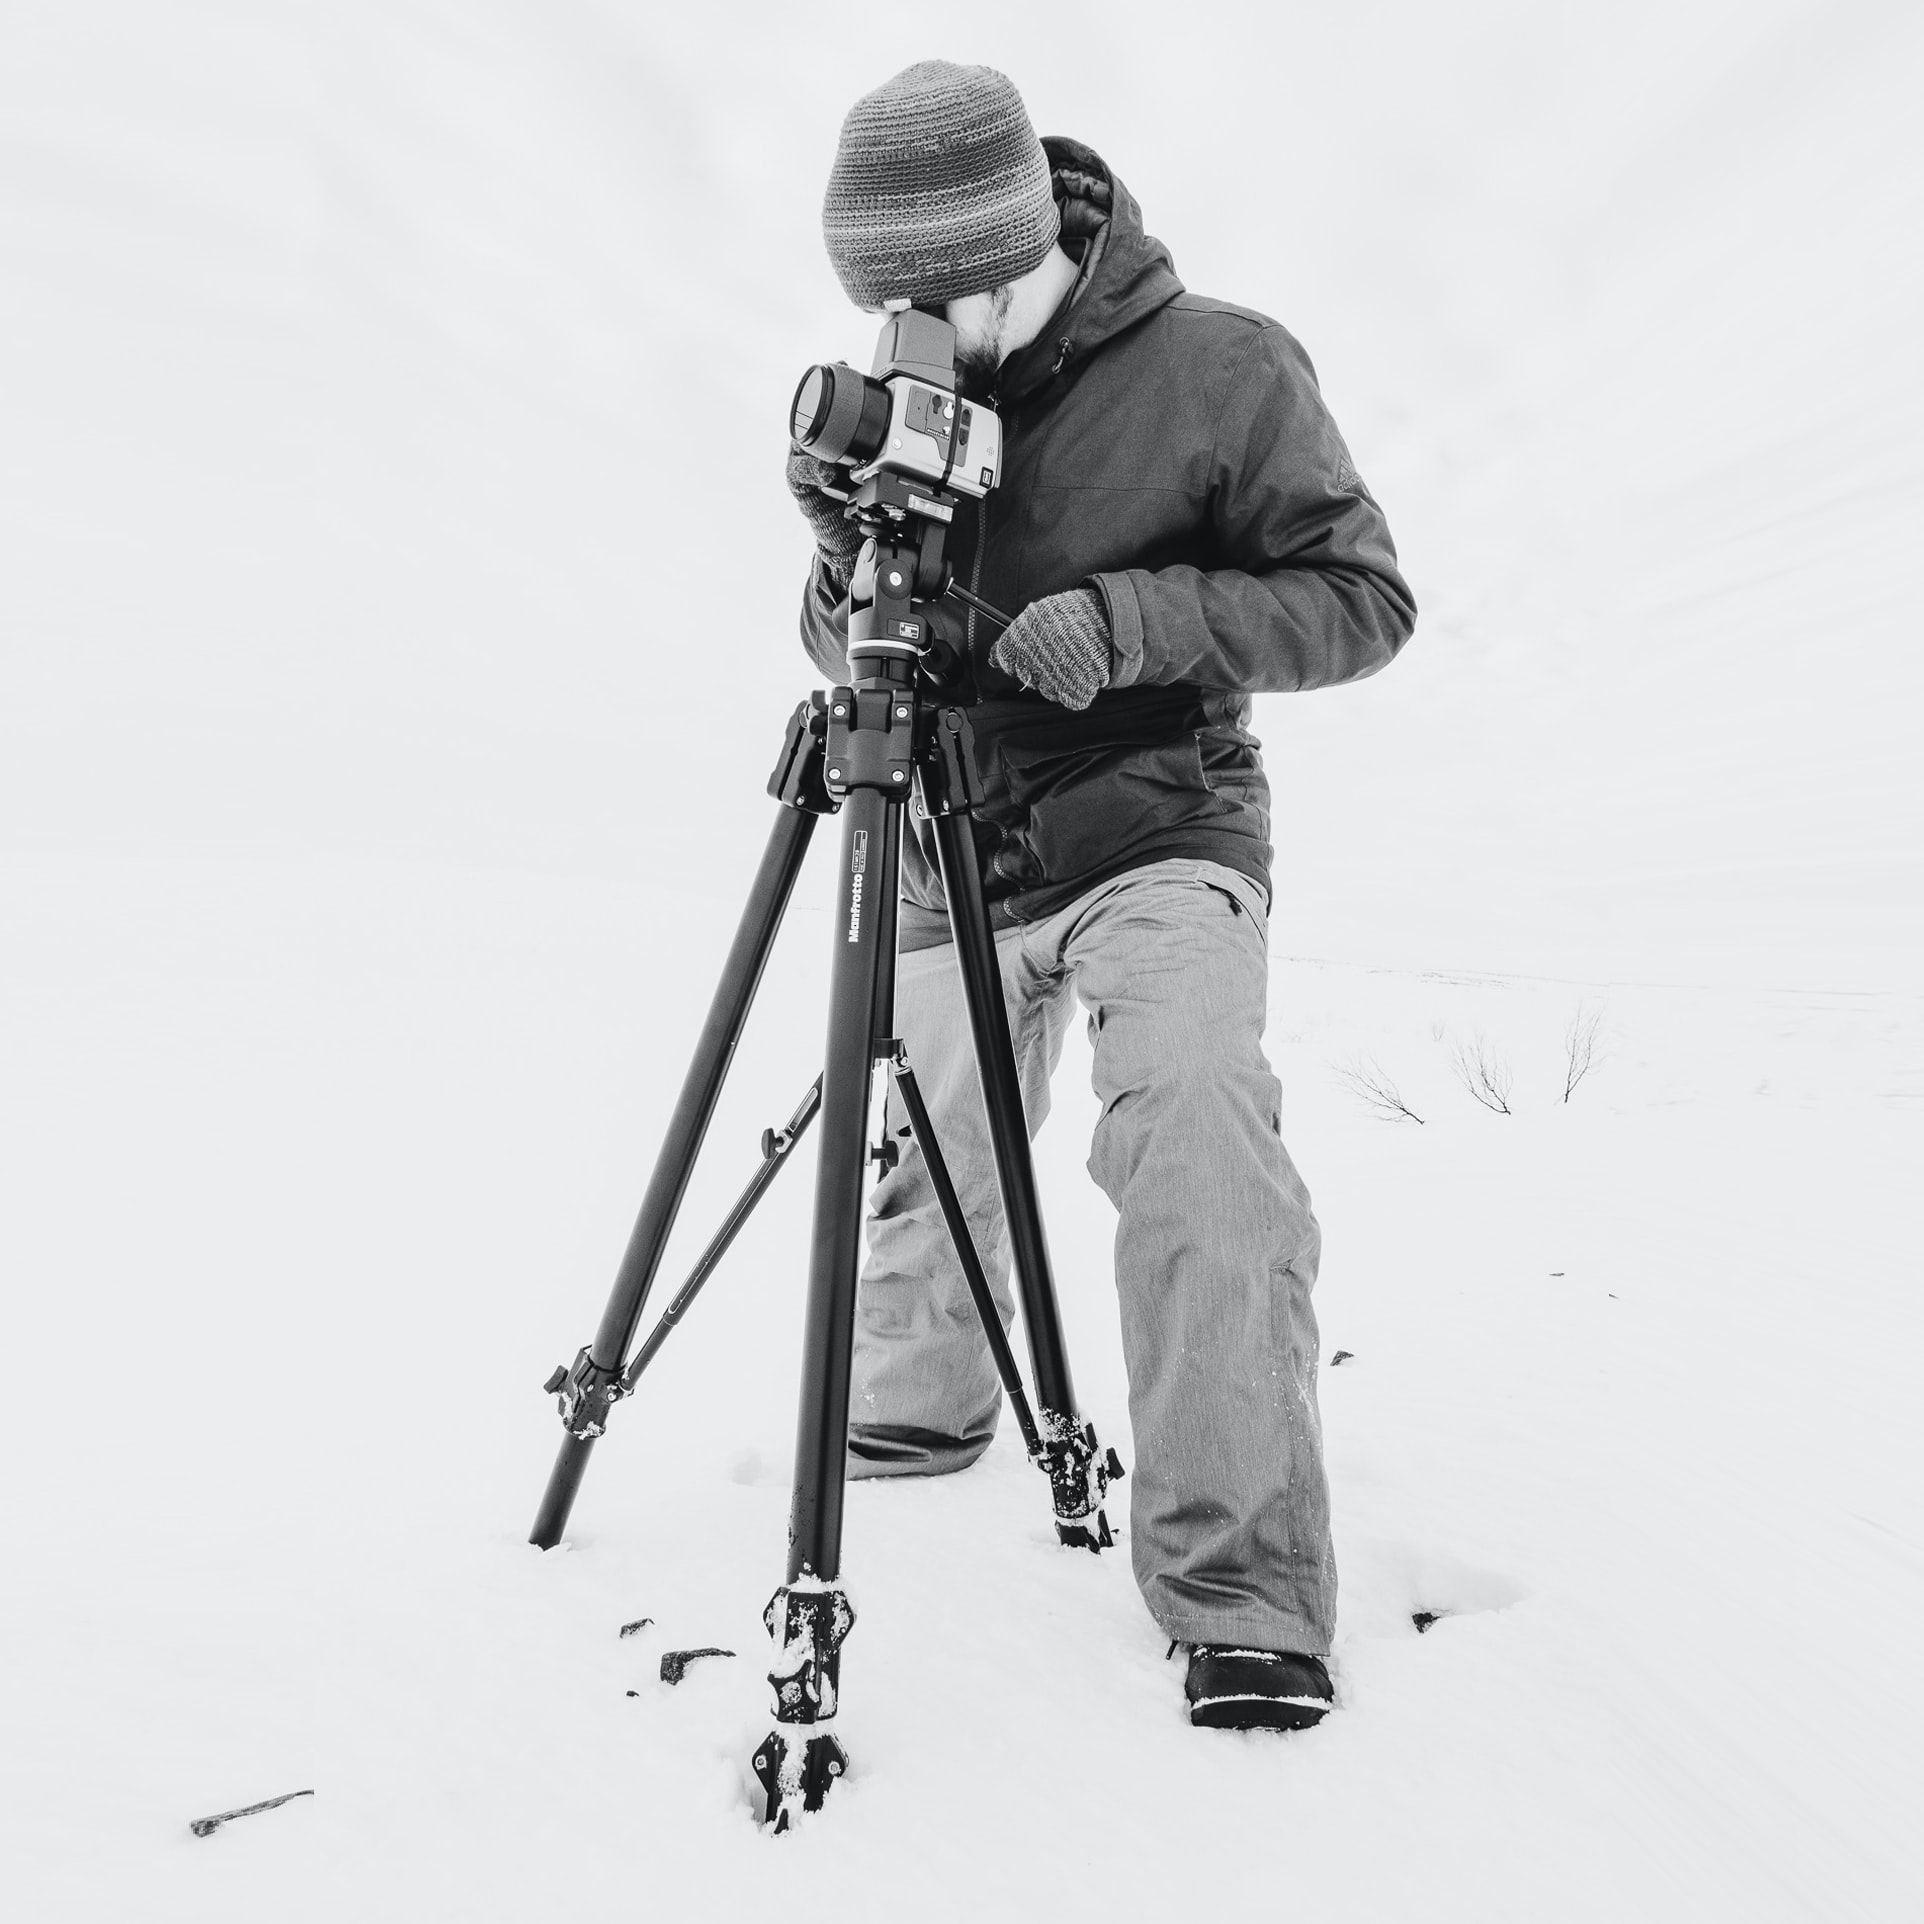 Art Lasovsky